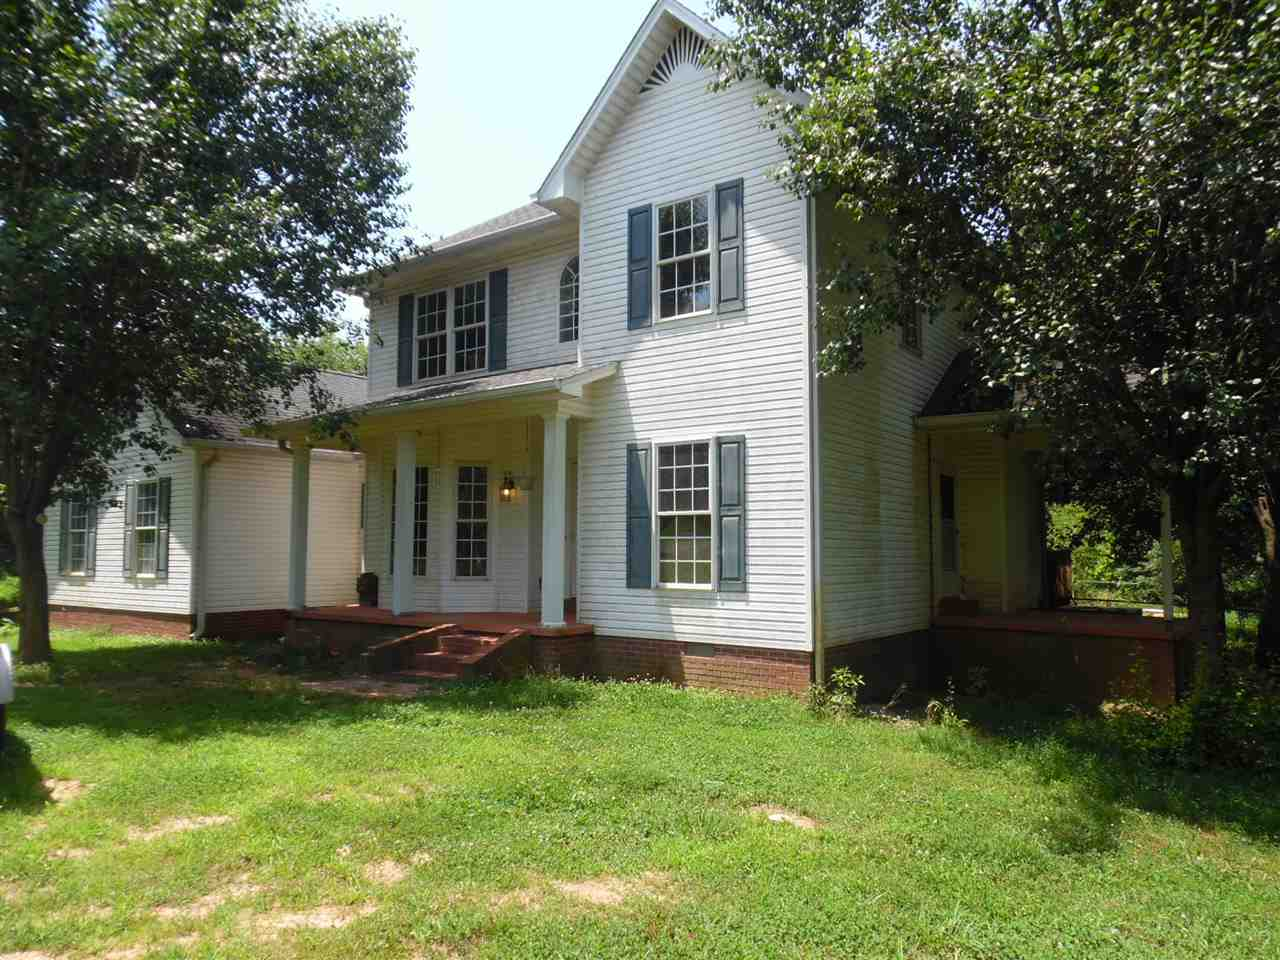 1445 Burnt Church Savannah, TN 38372 - MLS #: 10029282